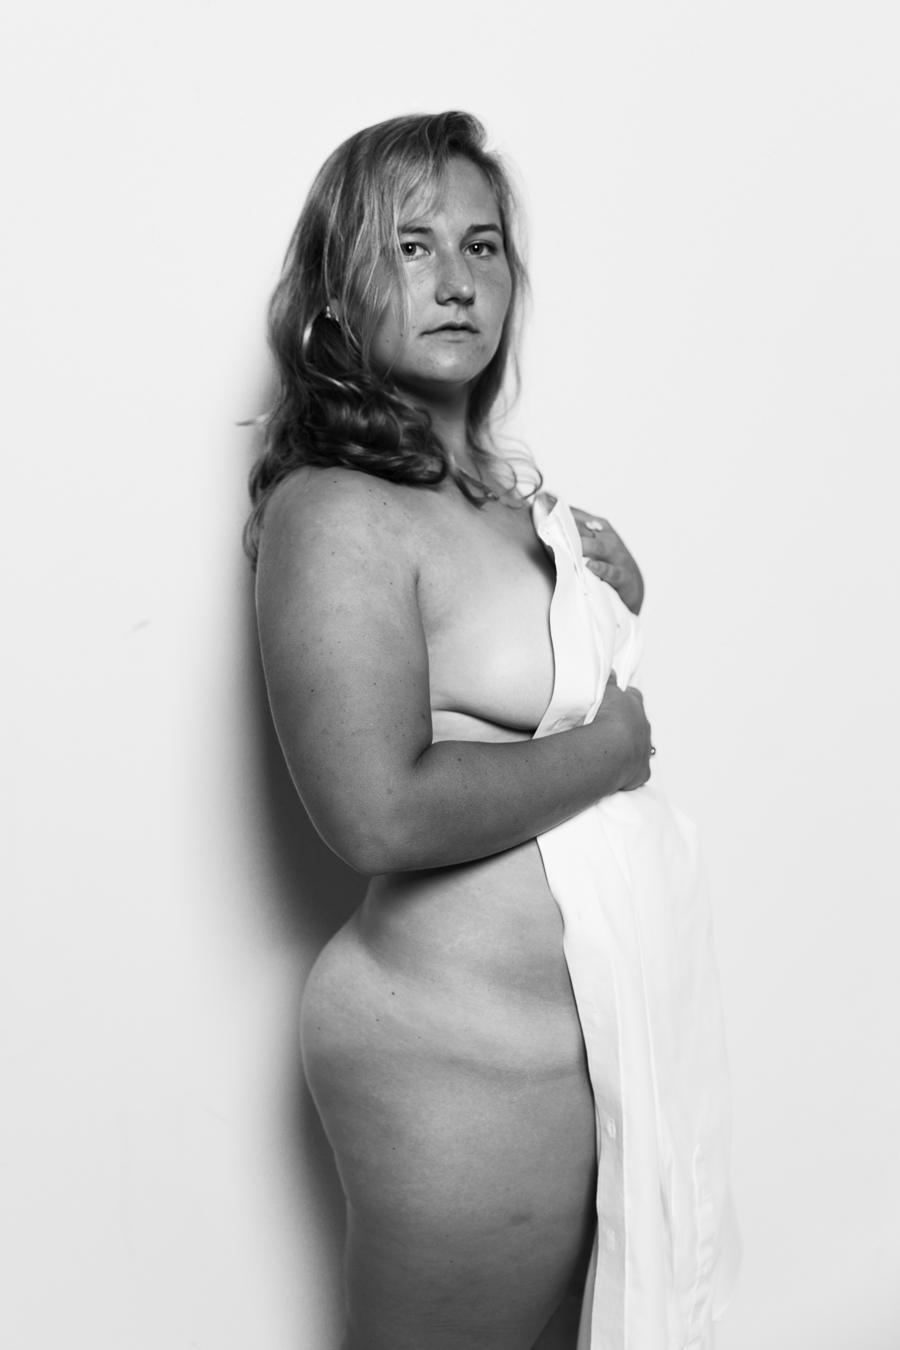 Noel_Zheng_Tony_Ward_Studio_University_of_Pennsylvania_Digital_Photography_Canon_5D_Mark_III_Fashion_Editorial_Black_and_White_Erotica_Nude_Bare_White_Shirt_Skin_Social_Project_Body_Positivity-9